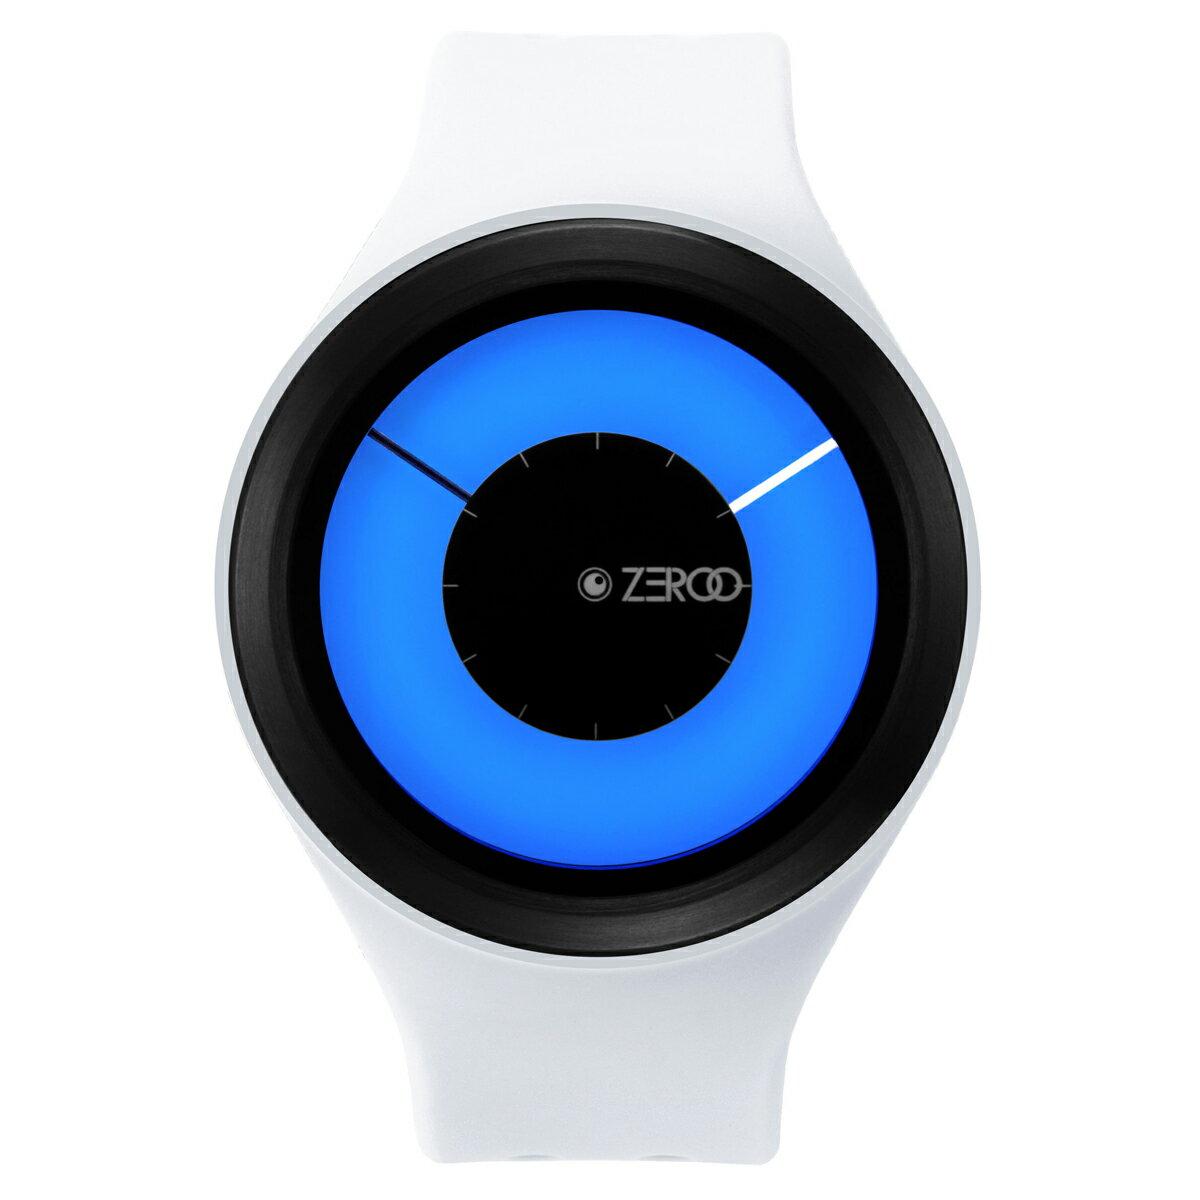 ZEROO MAGIA AURORA ゼロ 電池式クォーツ 腕時計 [W00802B03SR01] ホワイト デザインウォッチ ペア用 メンズ レディース ユニセックス おしゃれ時計 デザイナーズ